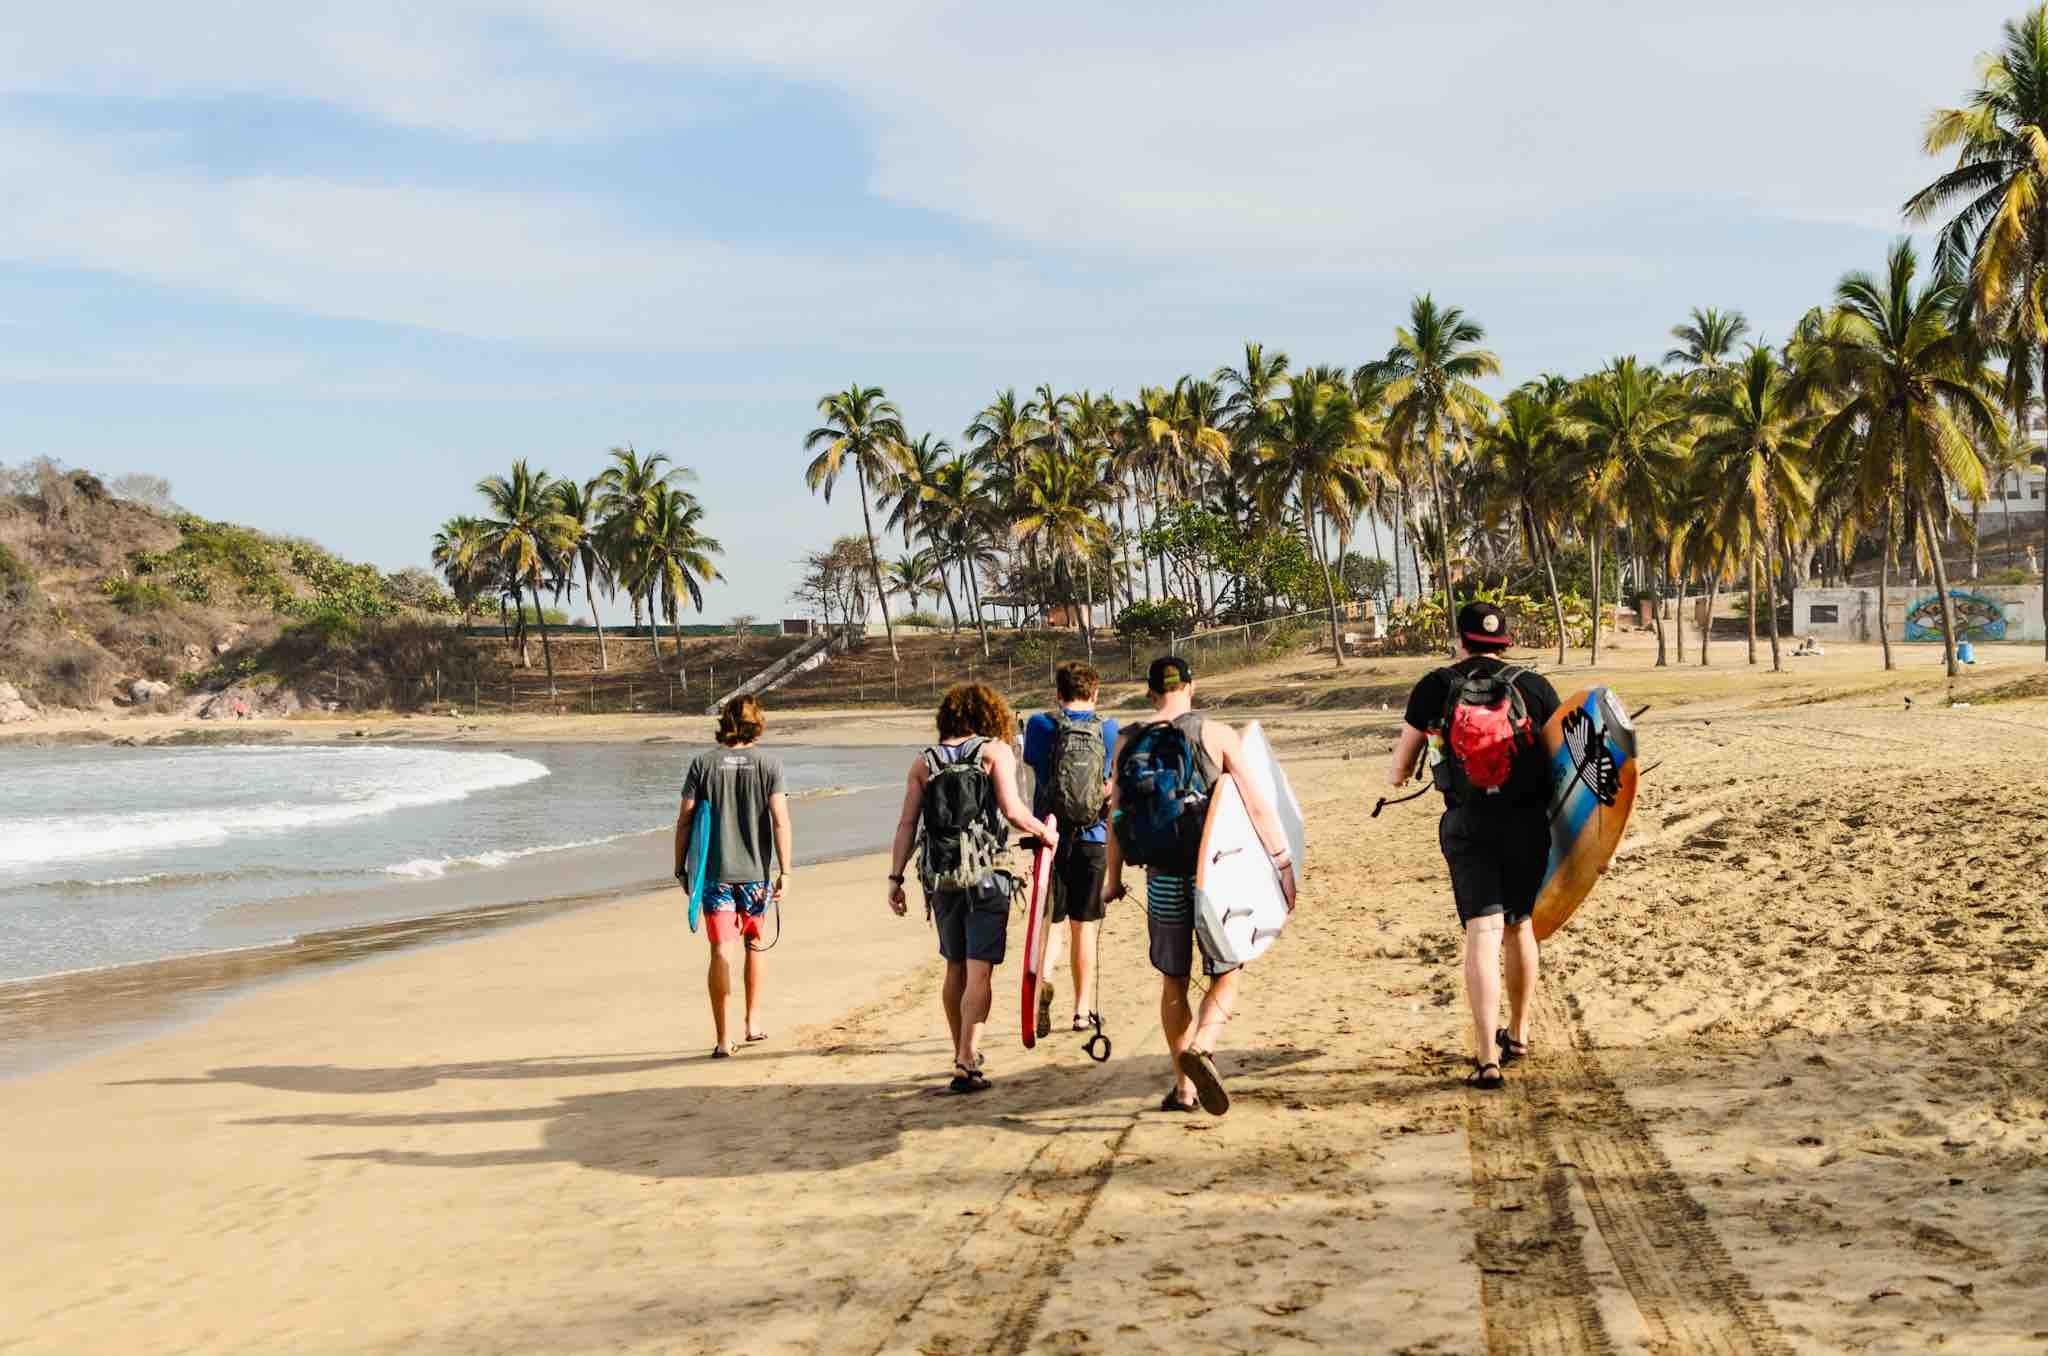 YWAM surfer missionaries walking down the beach in Mazatlan, Mexico